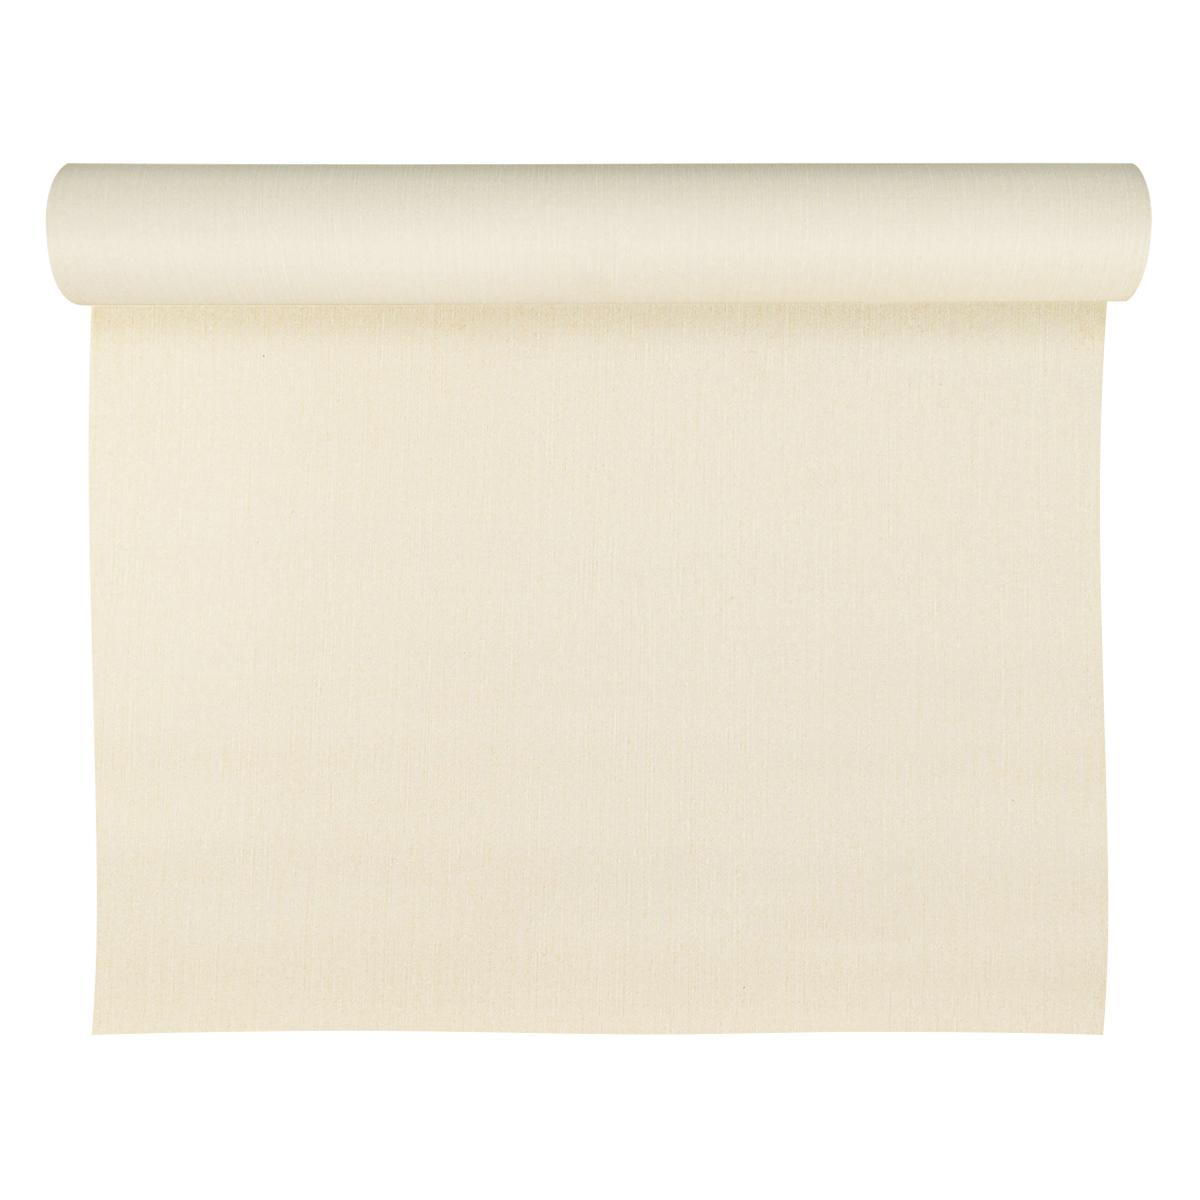 Papel Decorativo Fresh Beige Mate - 53X1000 cm - 5.30 m2